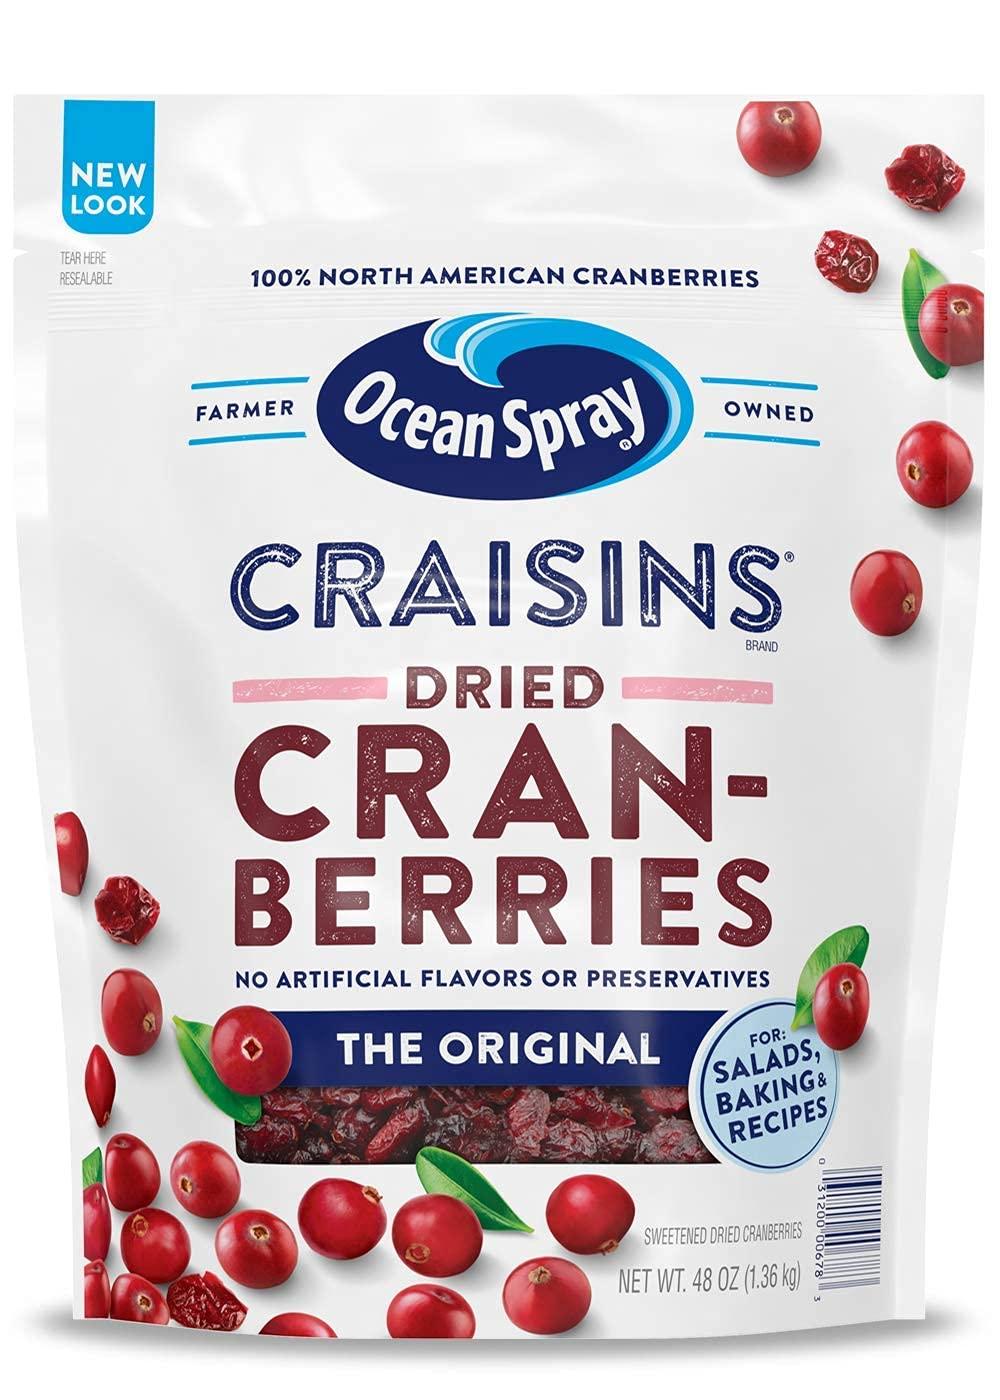 Ocean Spray Craisins Dried Cranberries, 3  pounds, $6.68 at Amazon $6.68